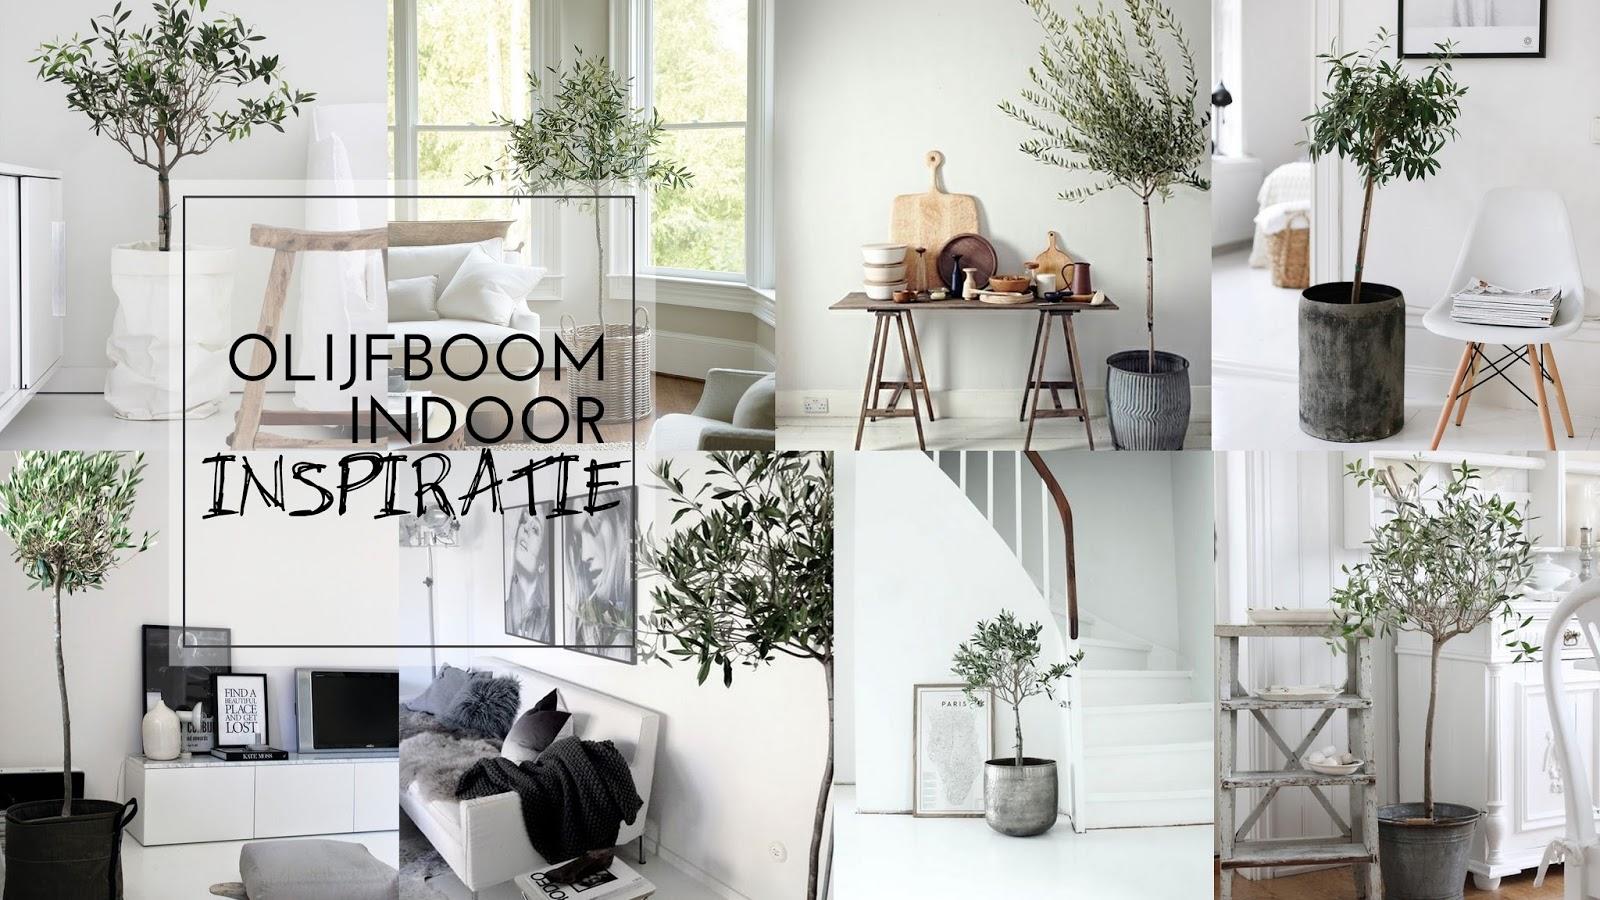 Interieur ideeen woonkamer fotos for Huis interieur ideeen